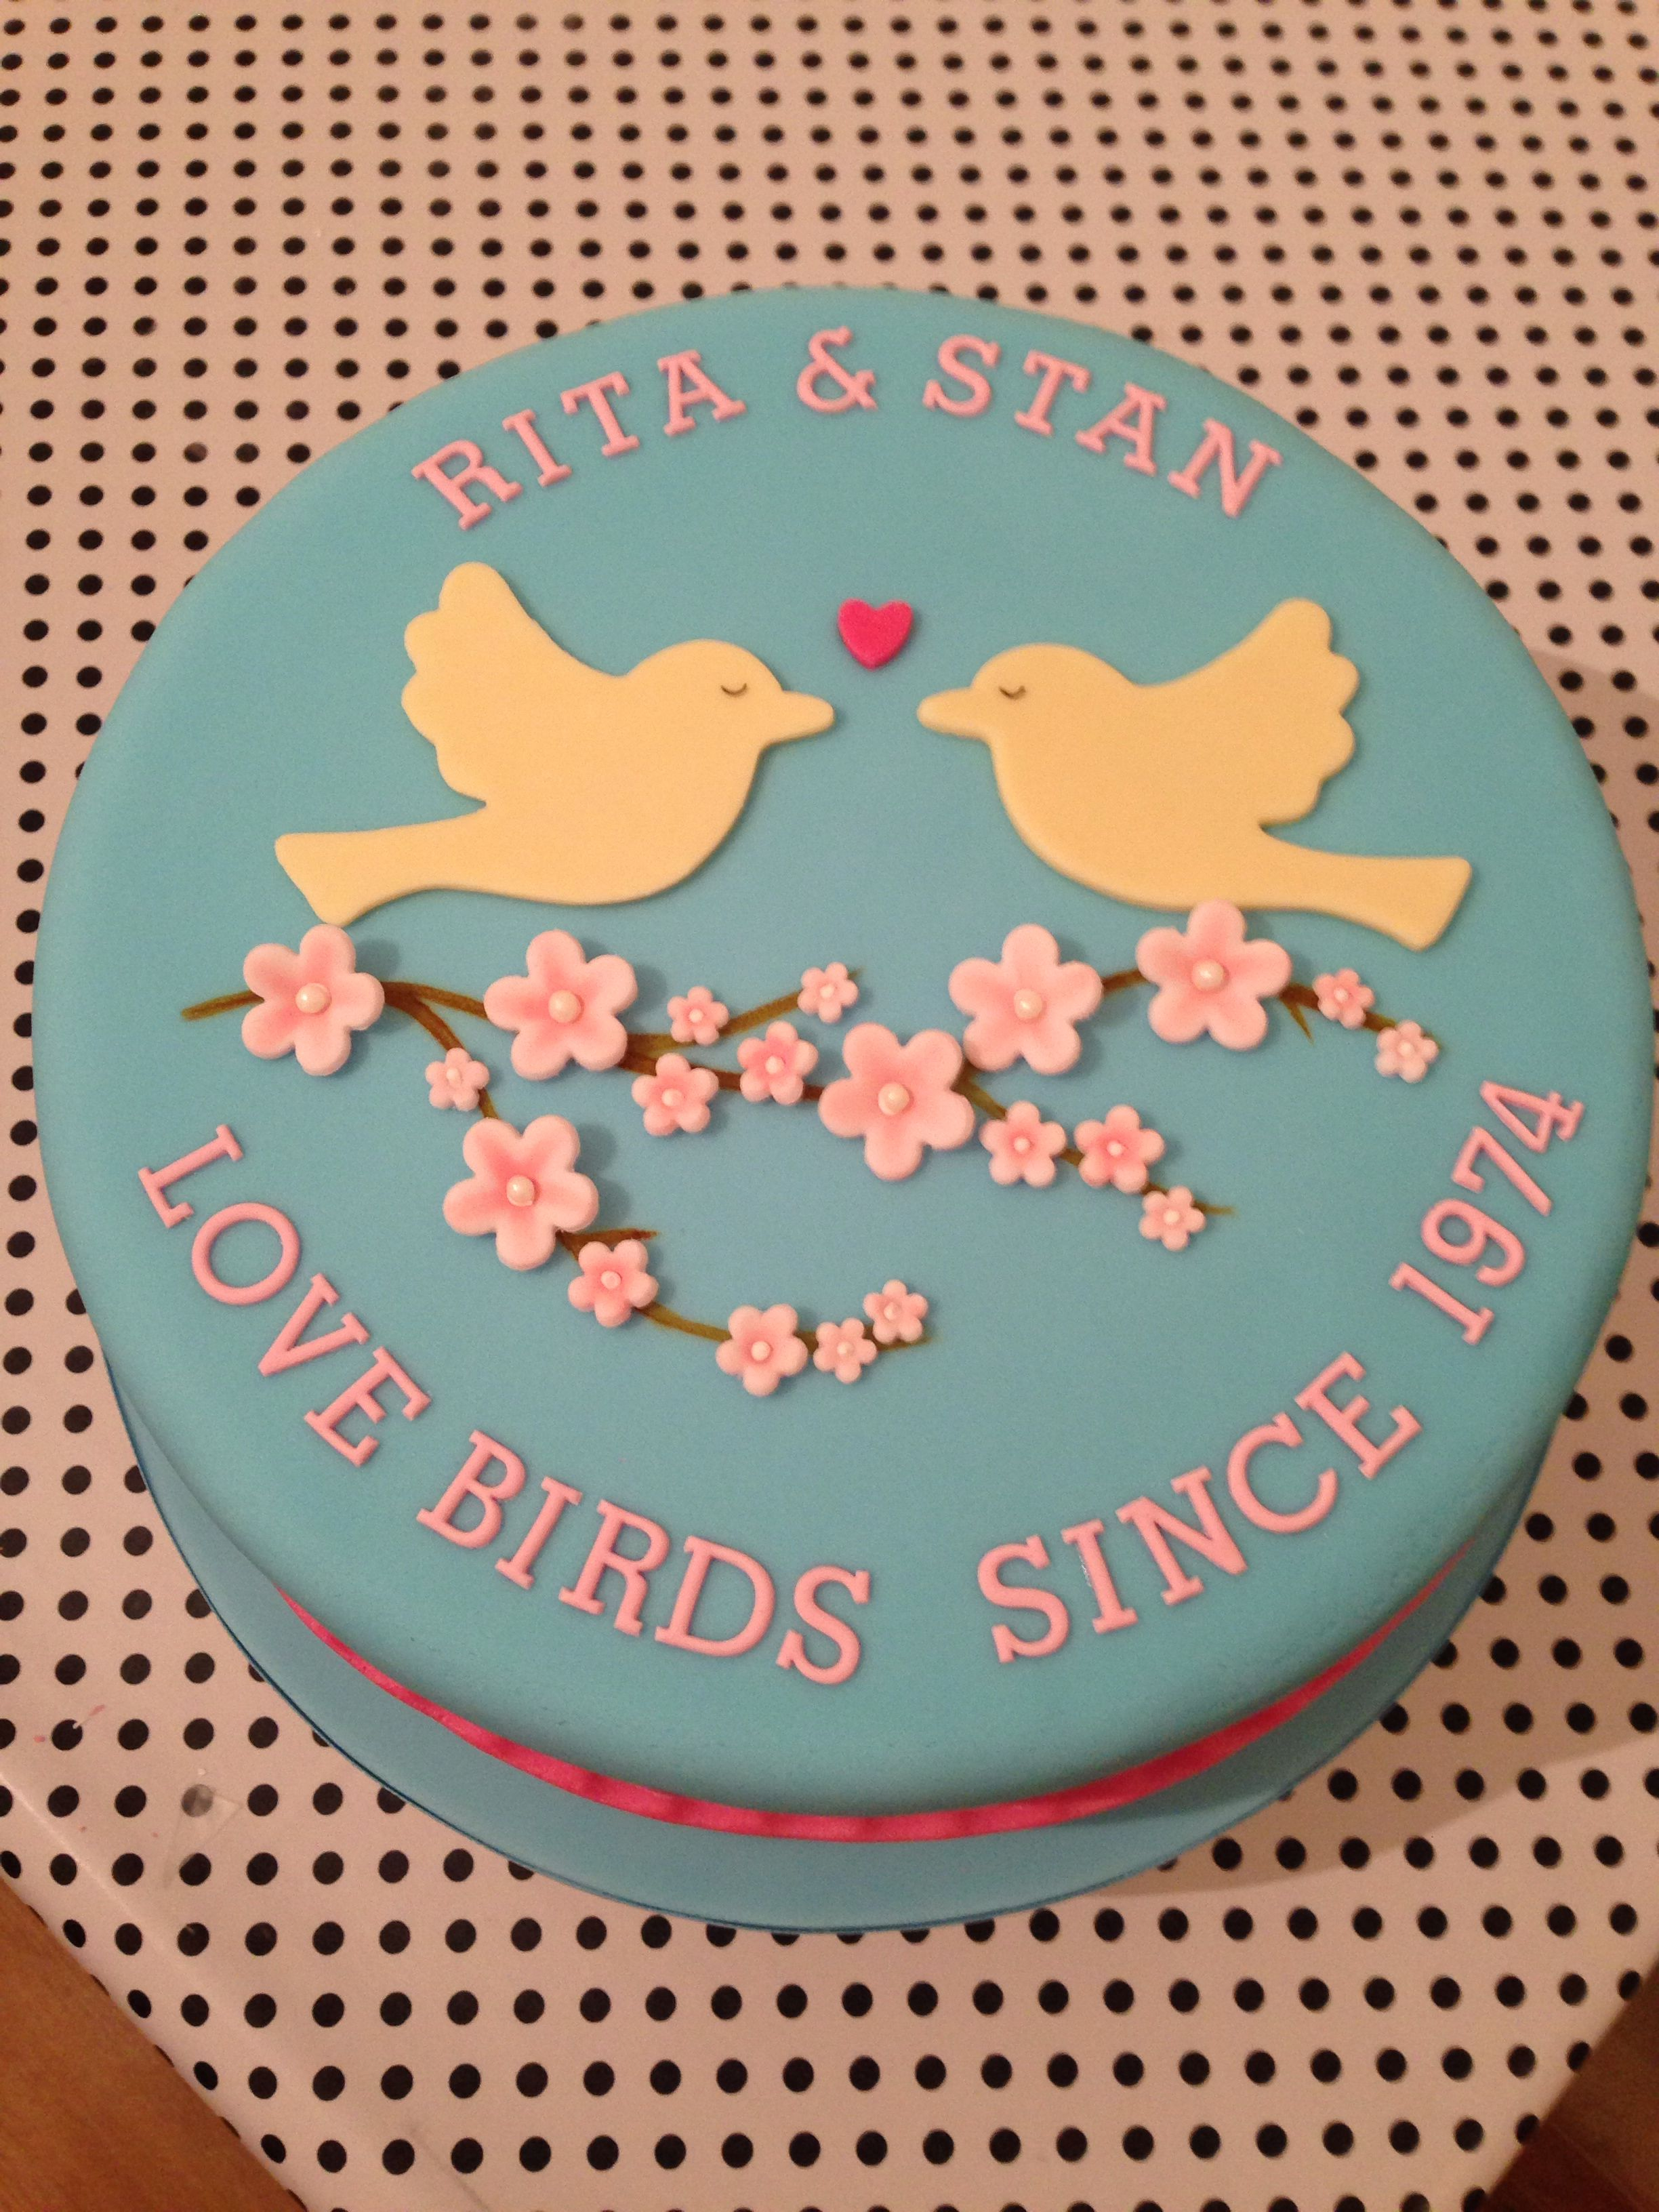 40th Wedding Anniversary Cake Love Birds